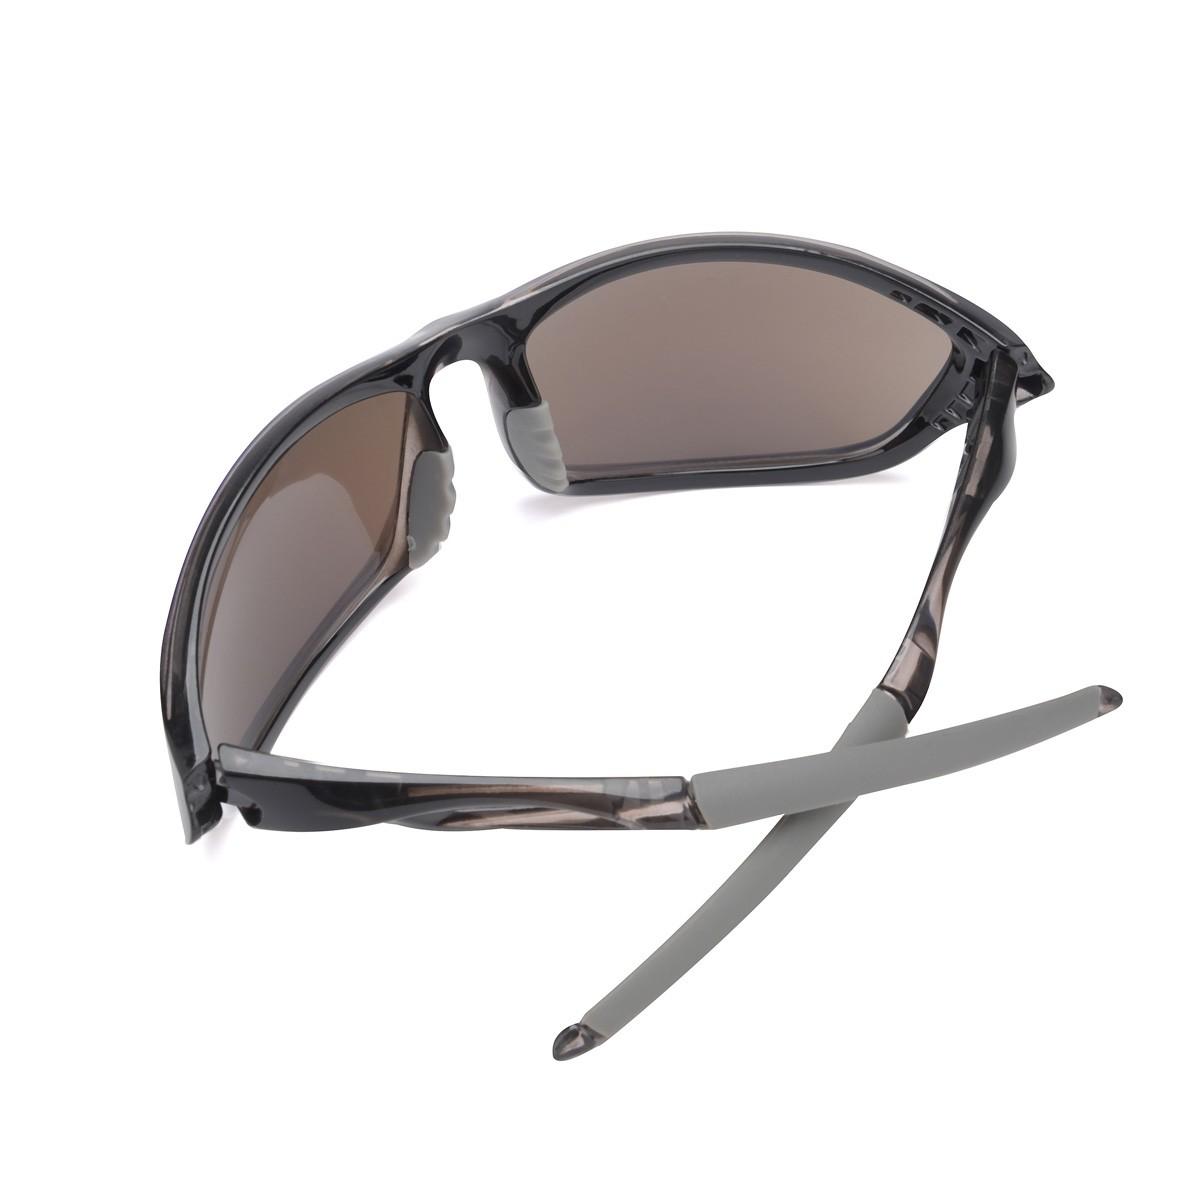 73f3d11d3 Mens Transition Wraparound Sunglasses Black. Style: SG1190BK-B Colour: